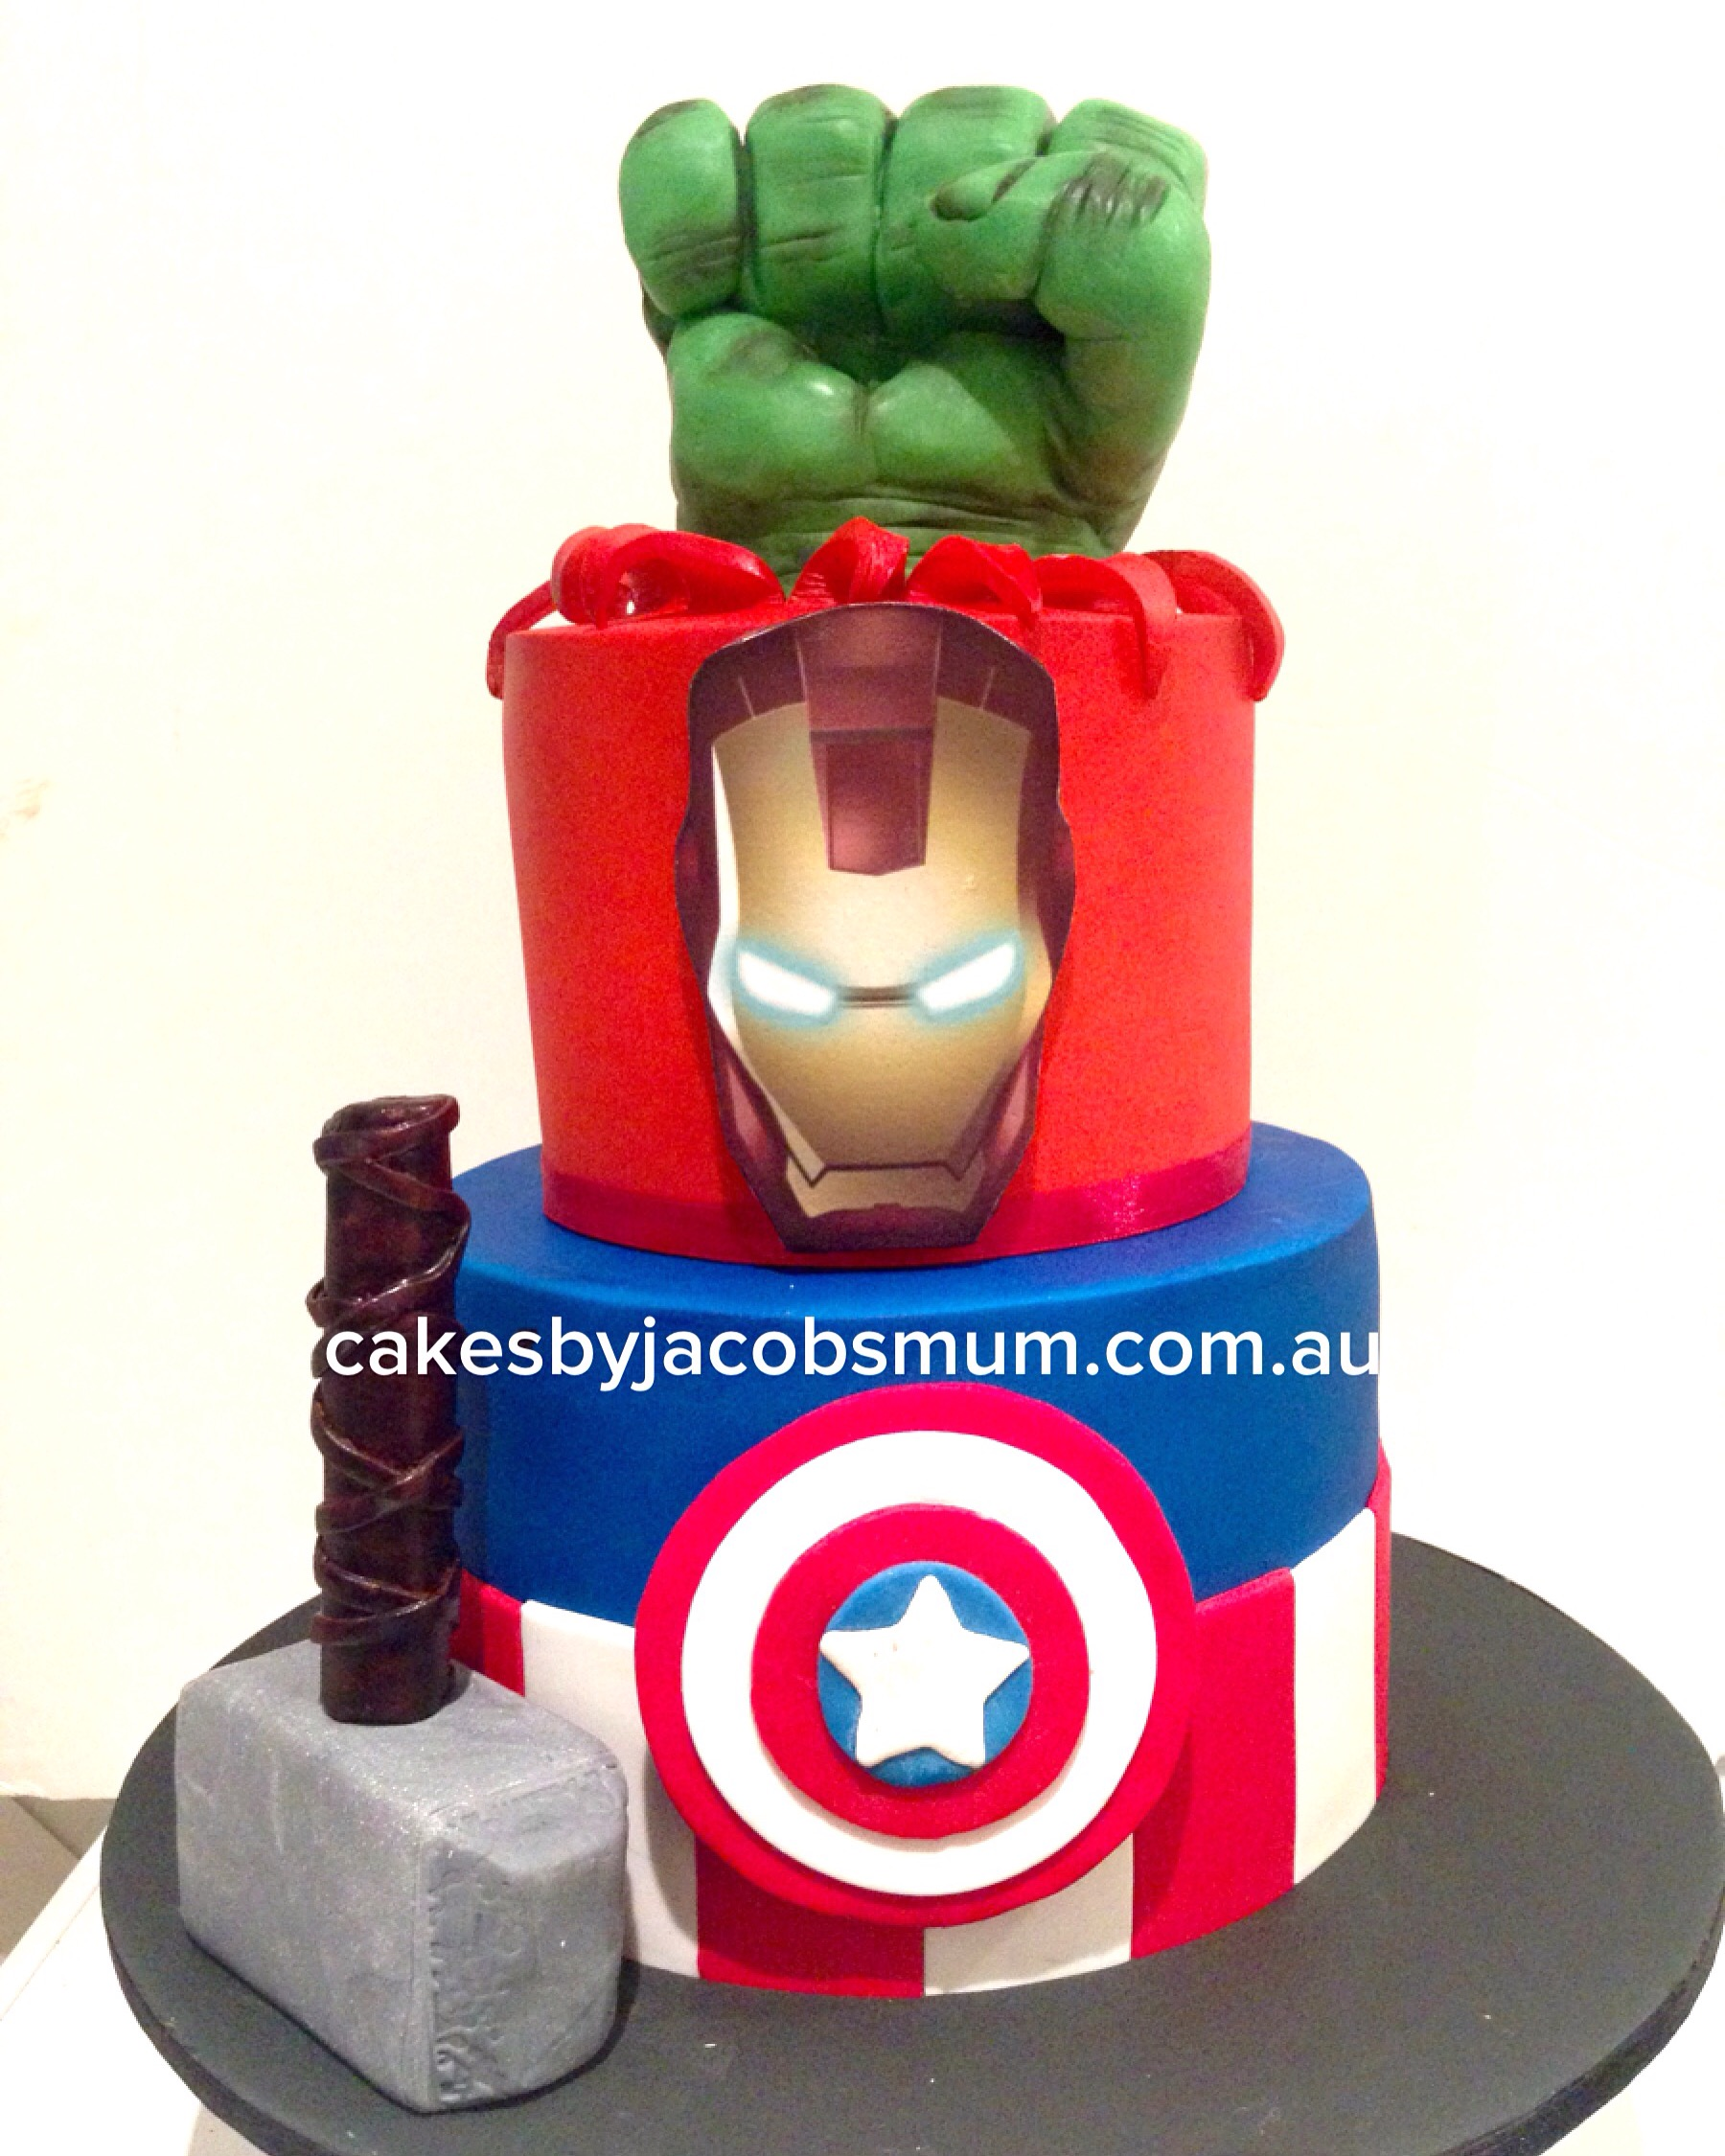 Cakes By Jacob S Mum Mascot Sydney Eastern Suburbs